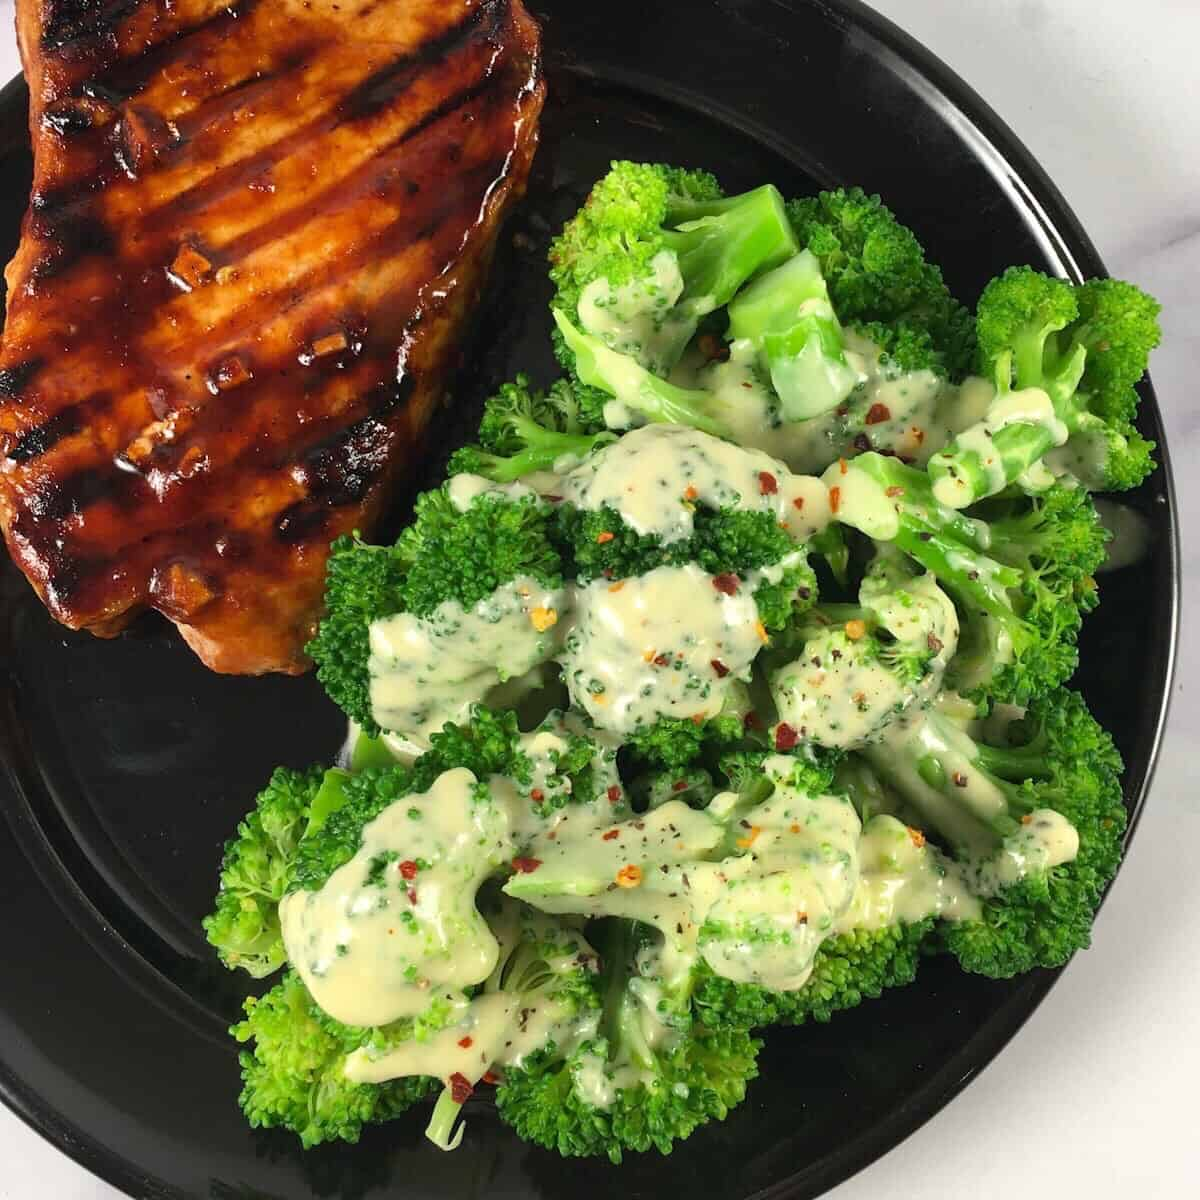 keto cheese dip and sauce on broccoli